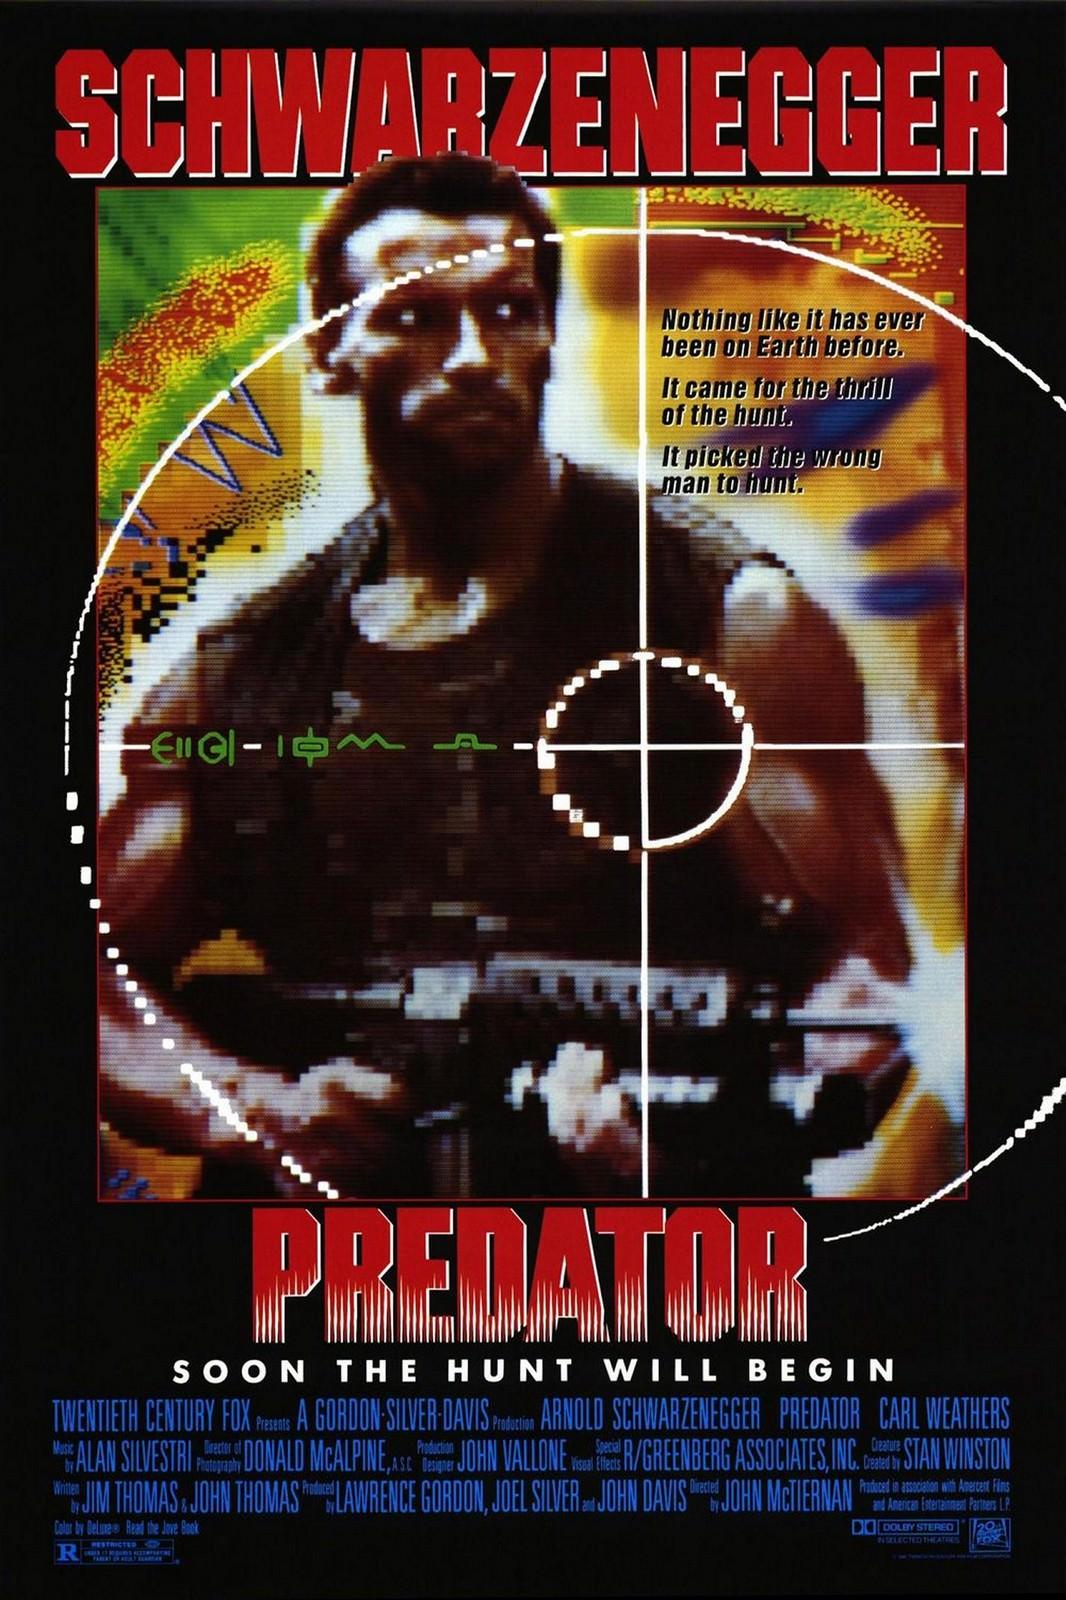 Movie, Predator(美國, 1987) / 終極戰士(台) / 铁血战士(中) / 鐵血戰士(港), 電影海報, 美國